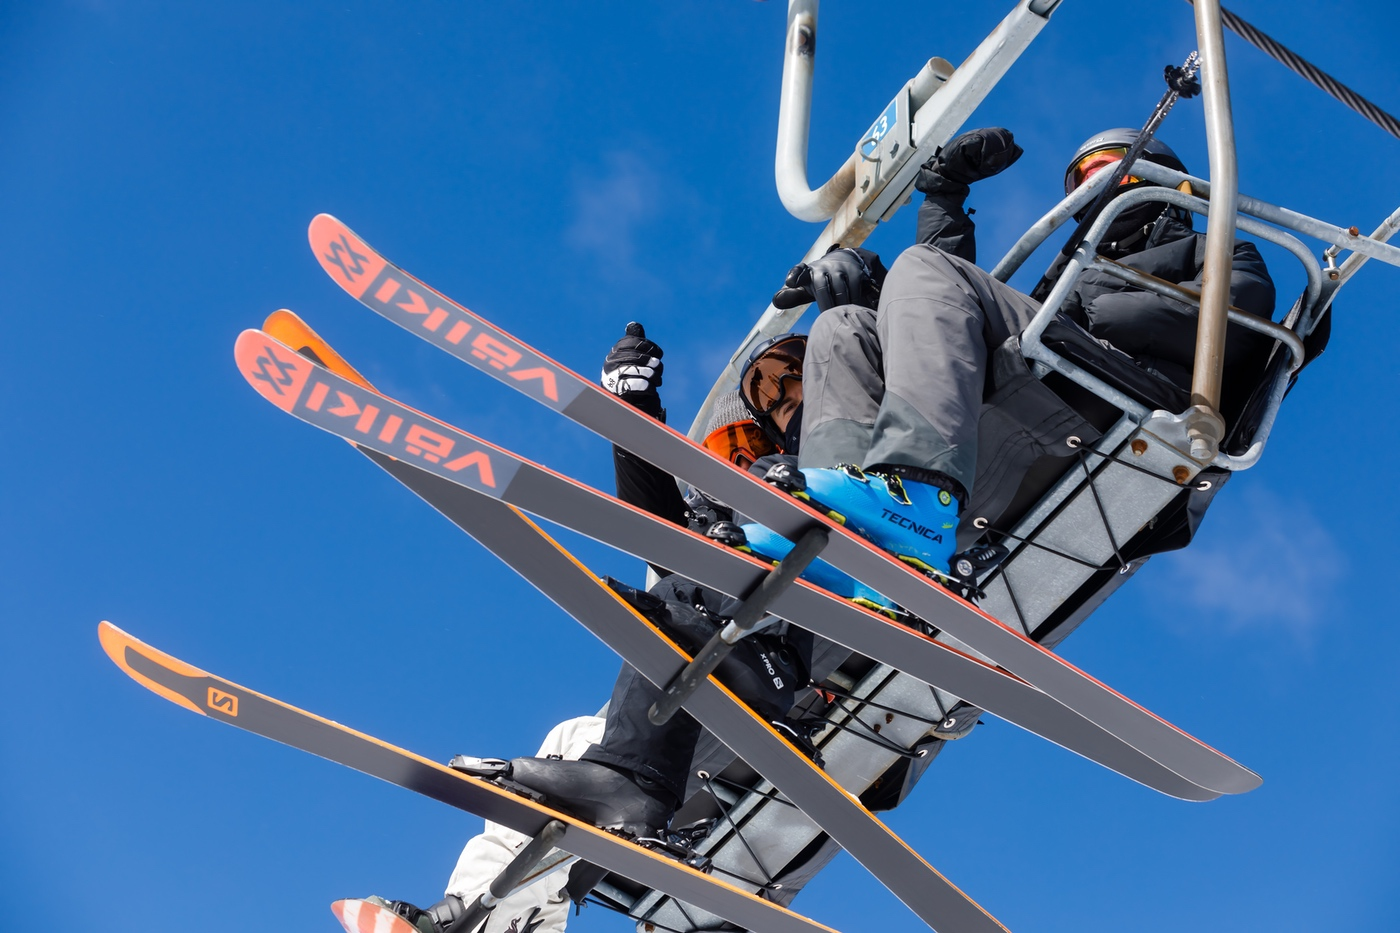 WinterKids Downhill 24 2021 SDP 3113